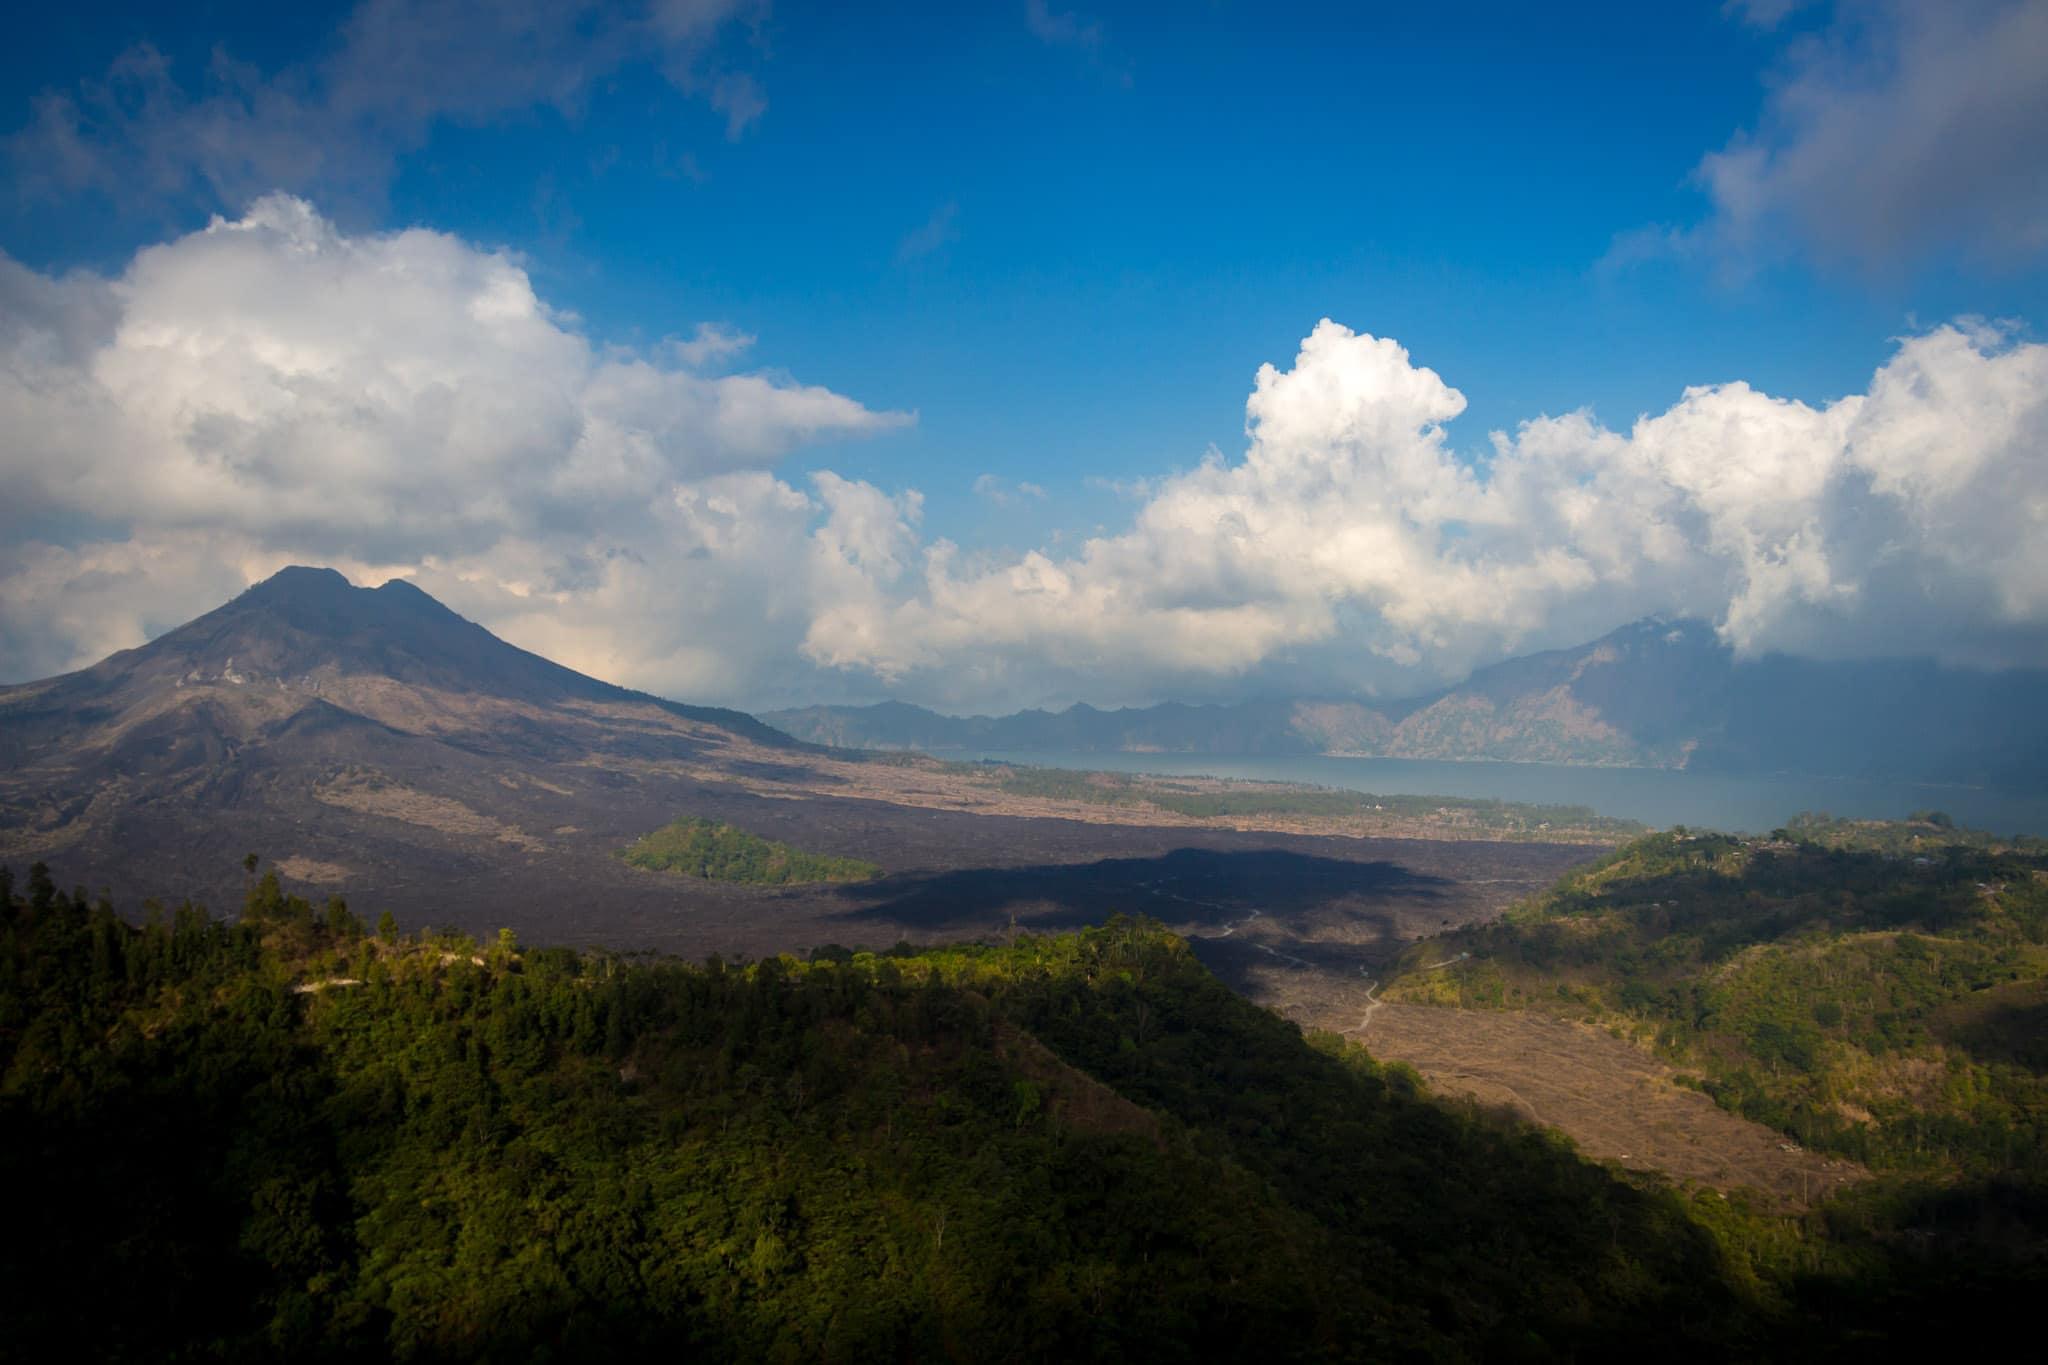 Mount Batur volcano and lake